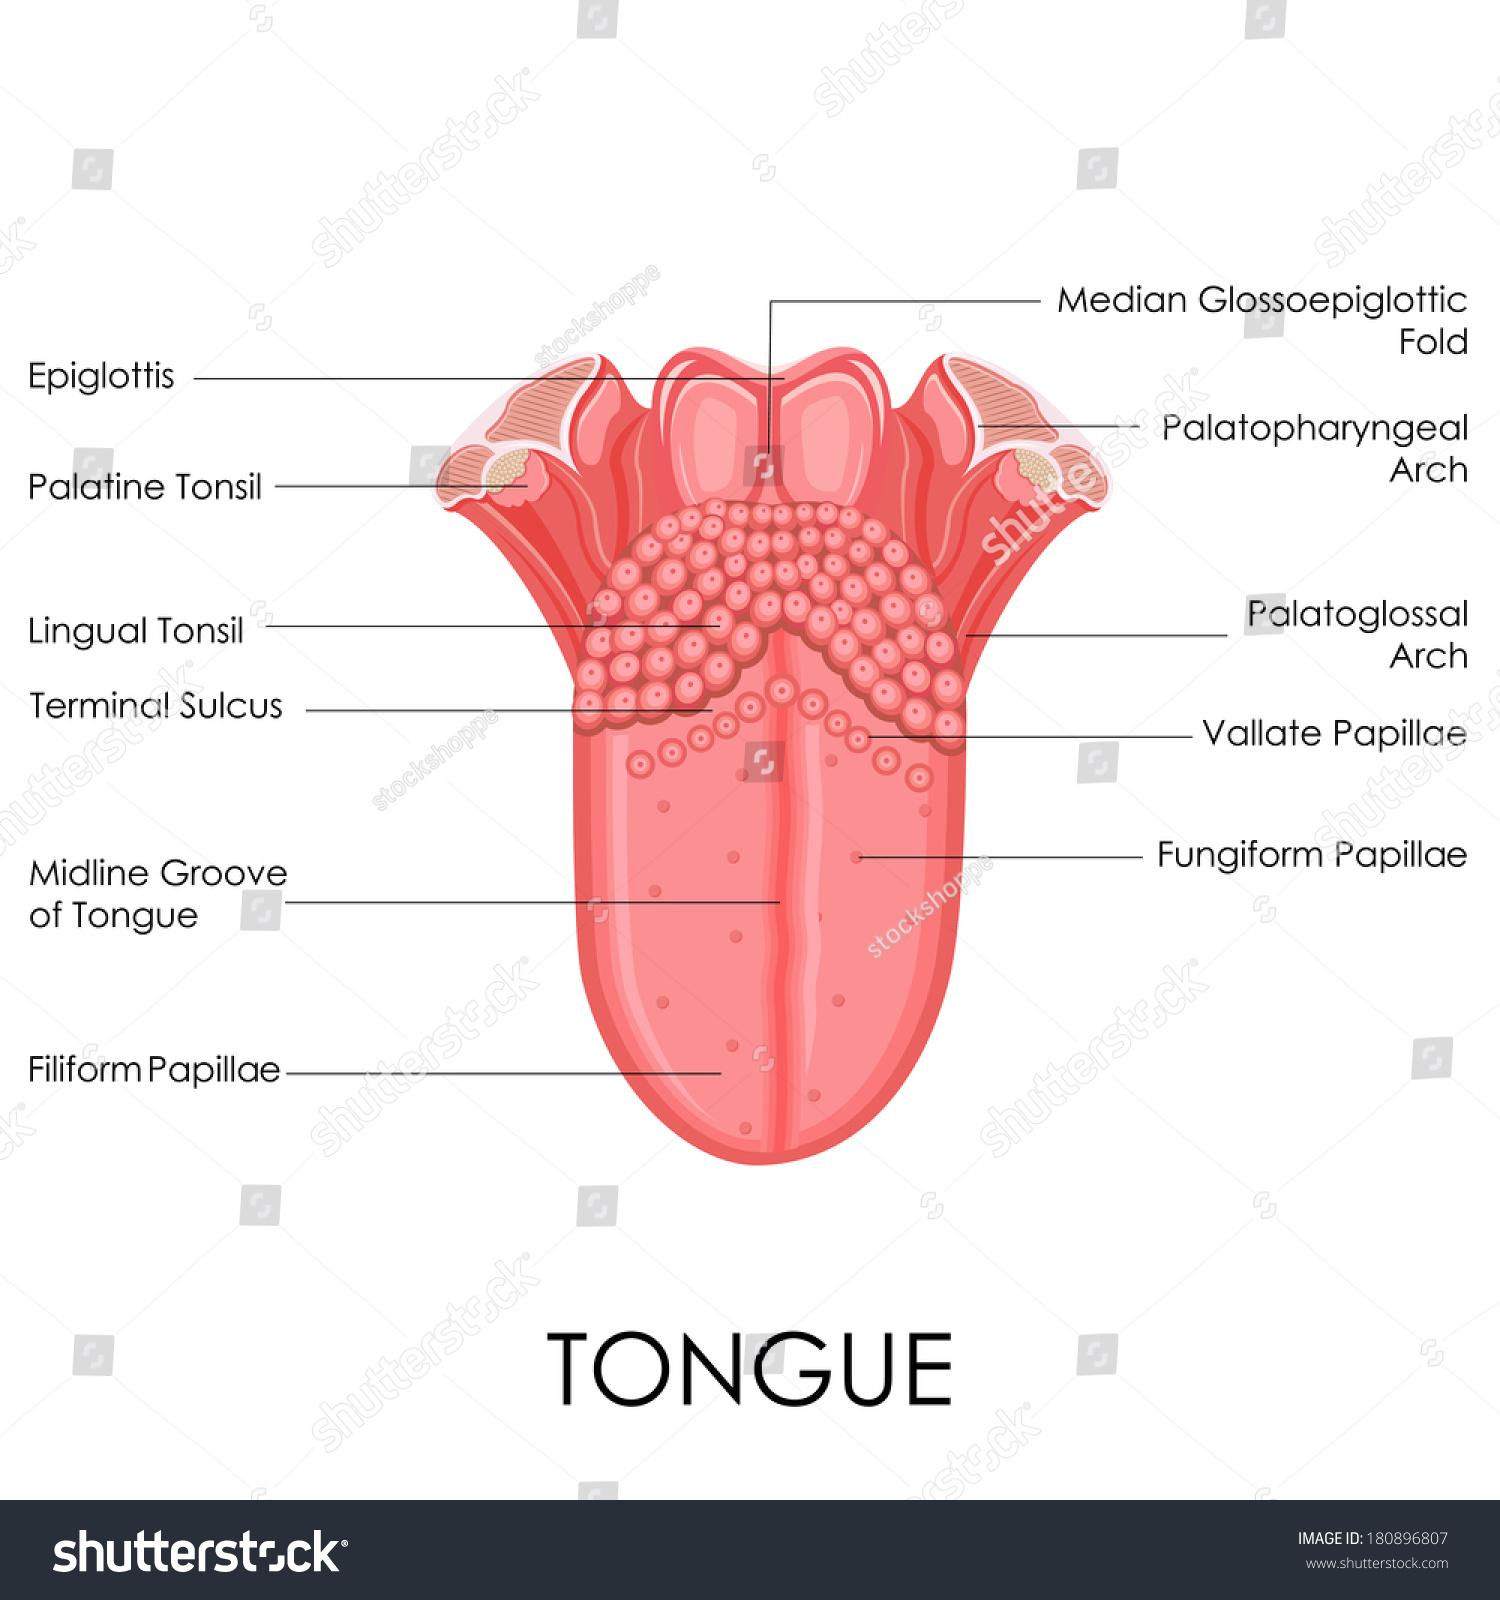 Tongue Illustration